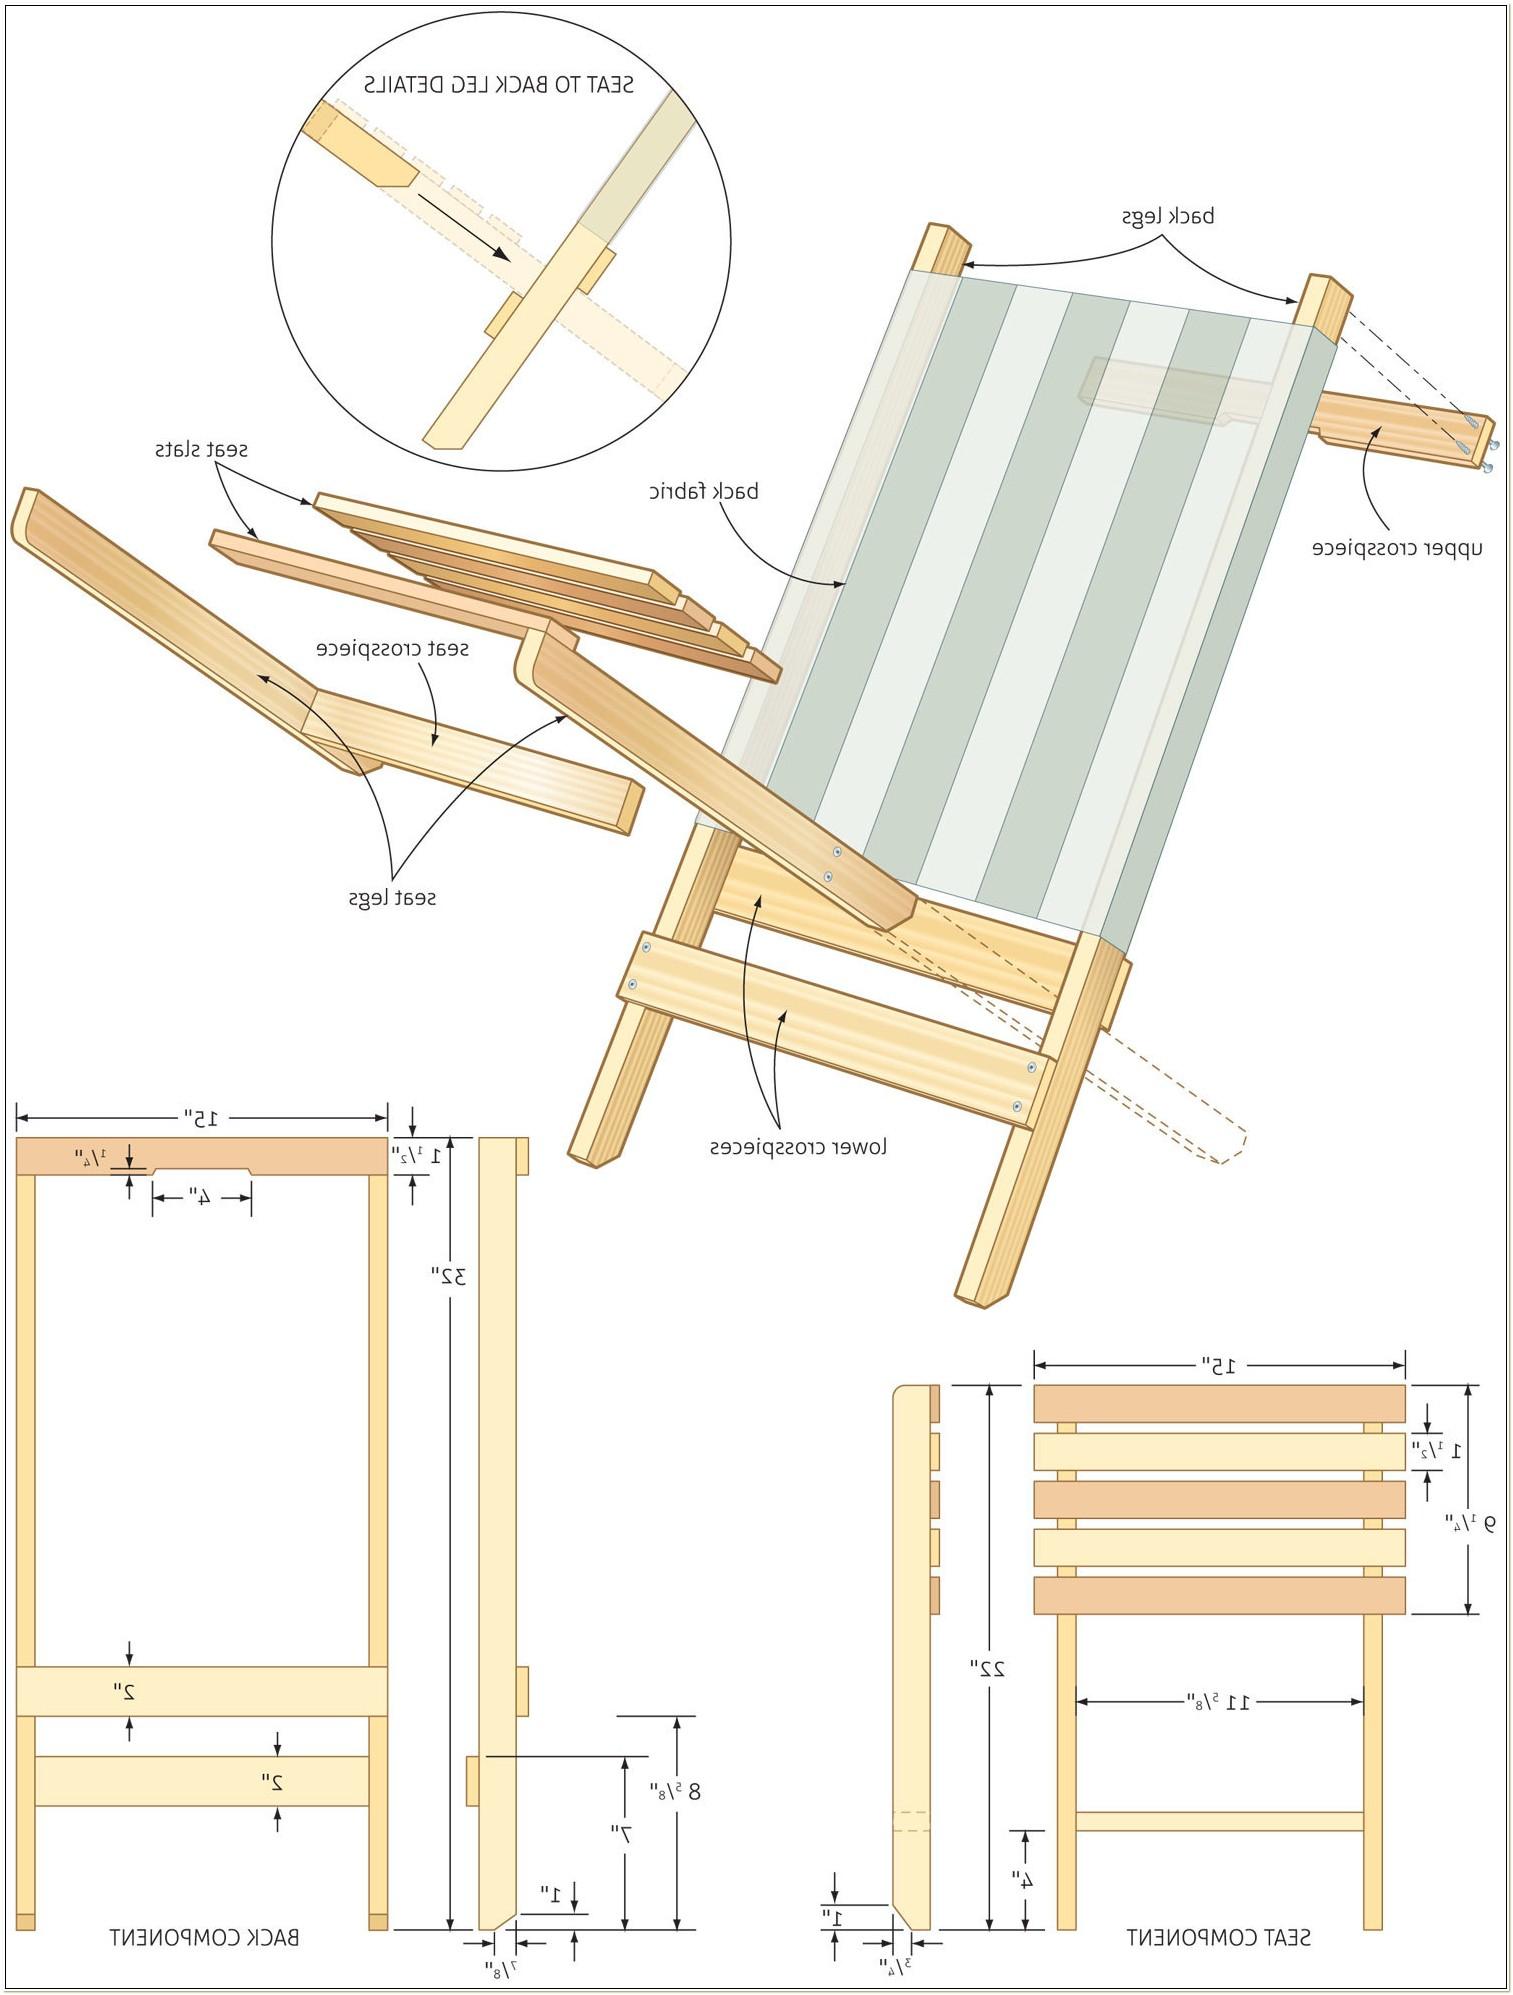 Folding Wooden Lawn Chair Plans